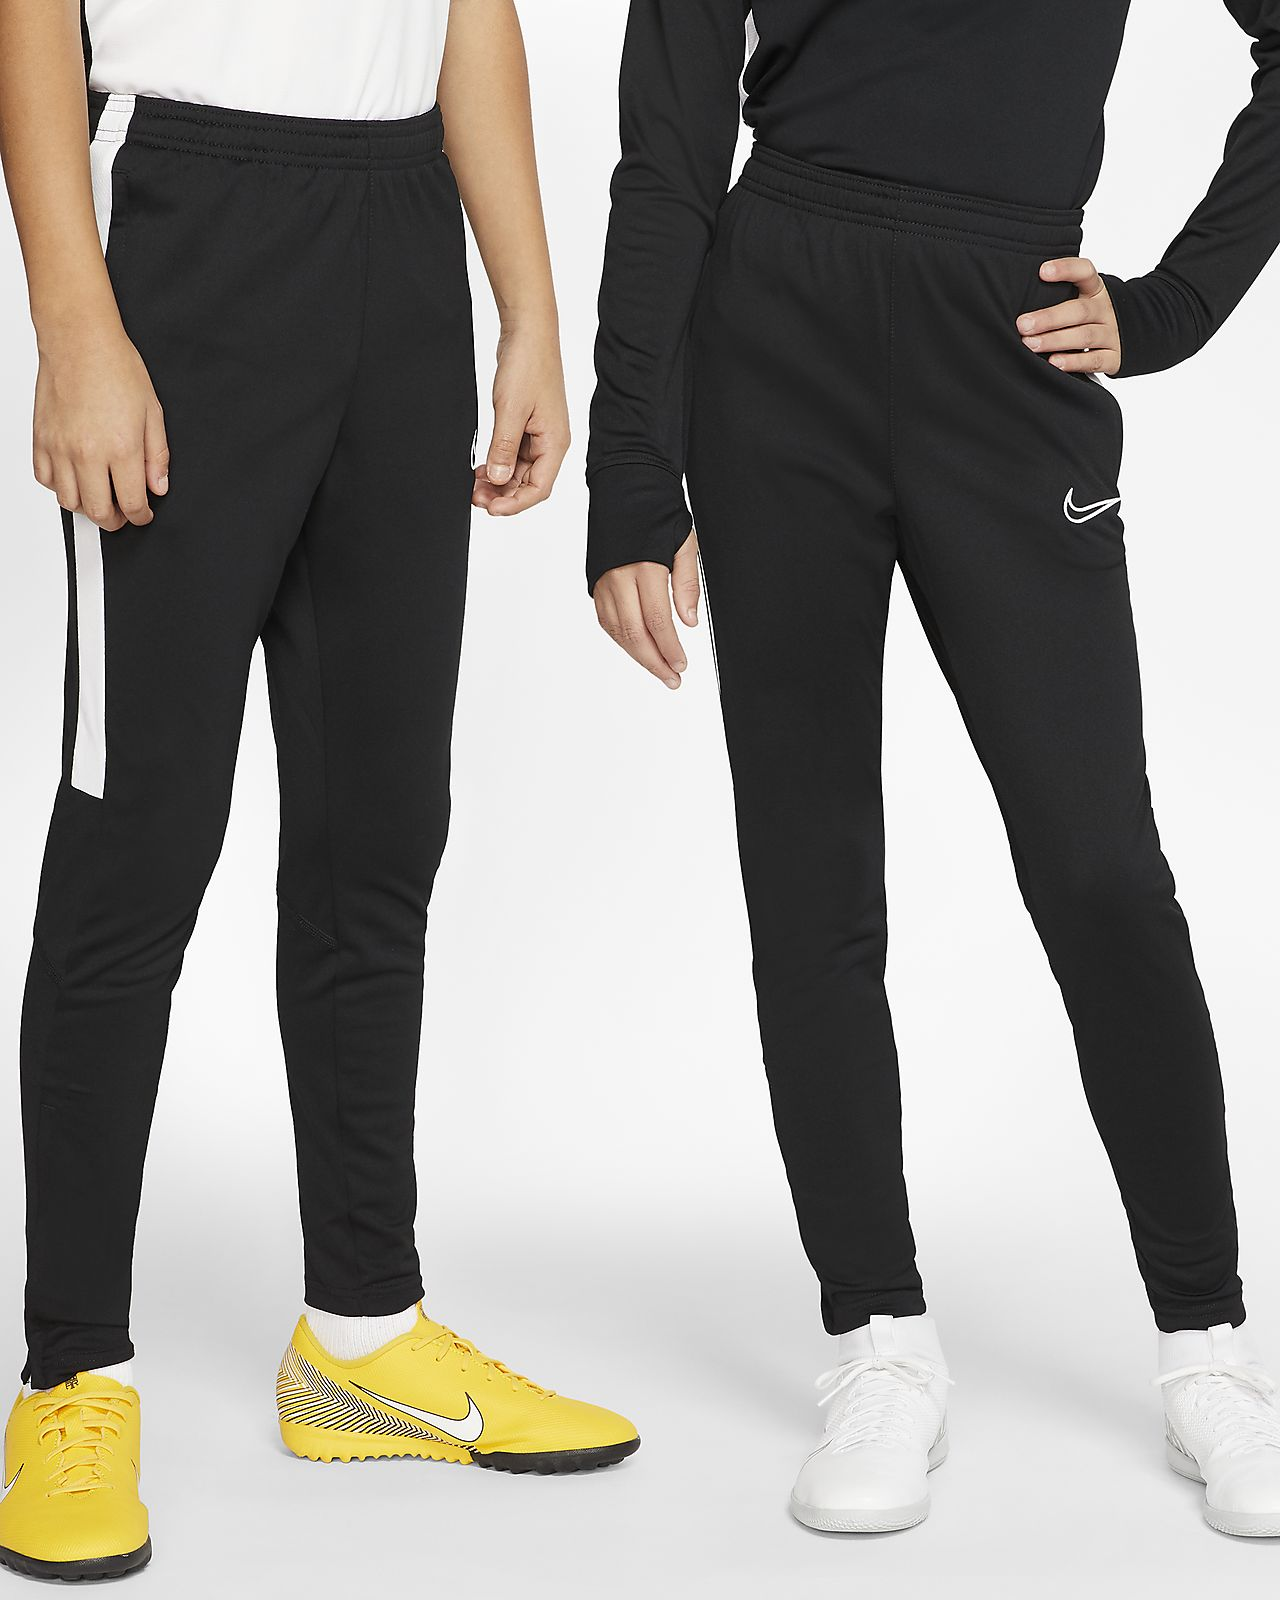 Nike Therma Dri Fit Pants Sports, Men's Fashion, Clothes